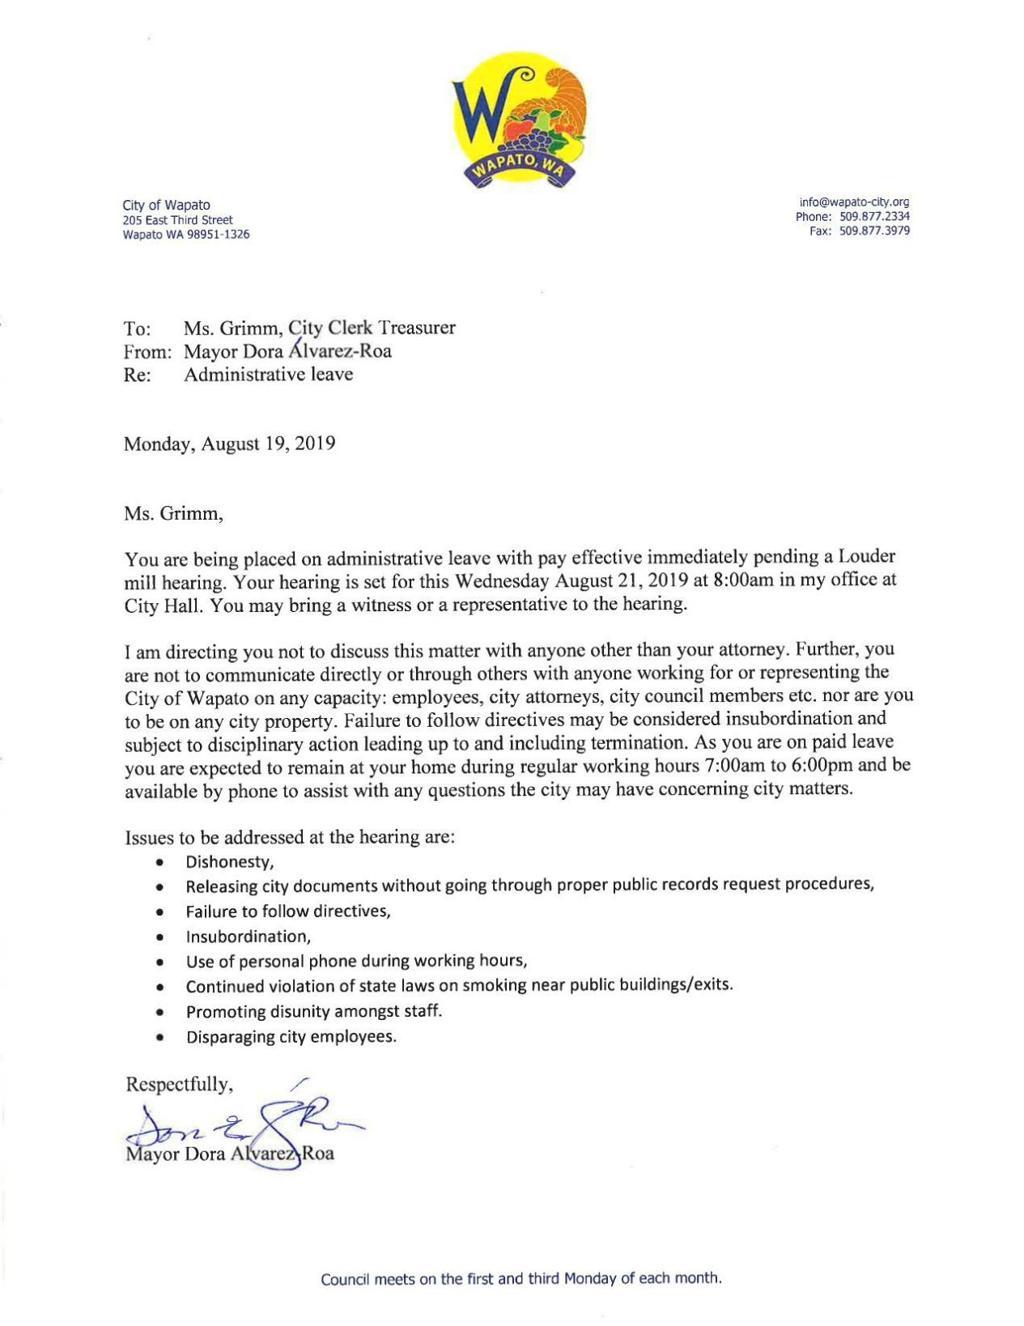 Wapato mayor fires clerk-treasurer as tensions mount   Local